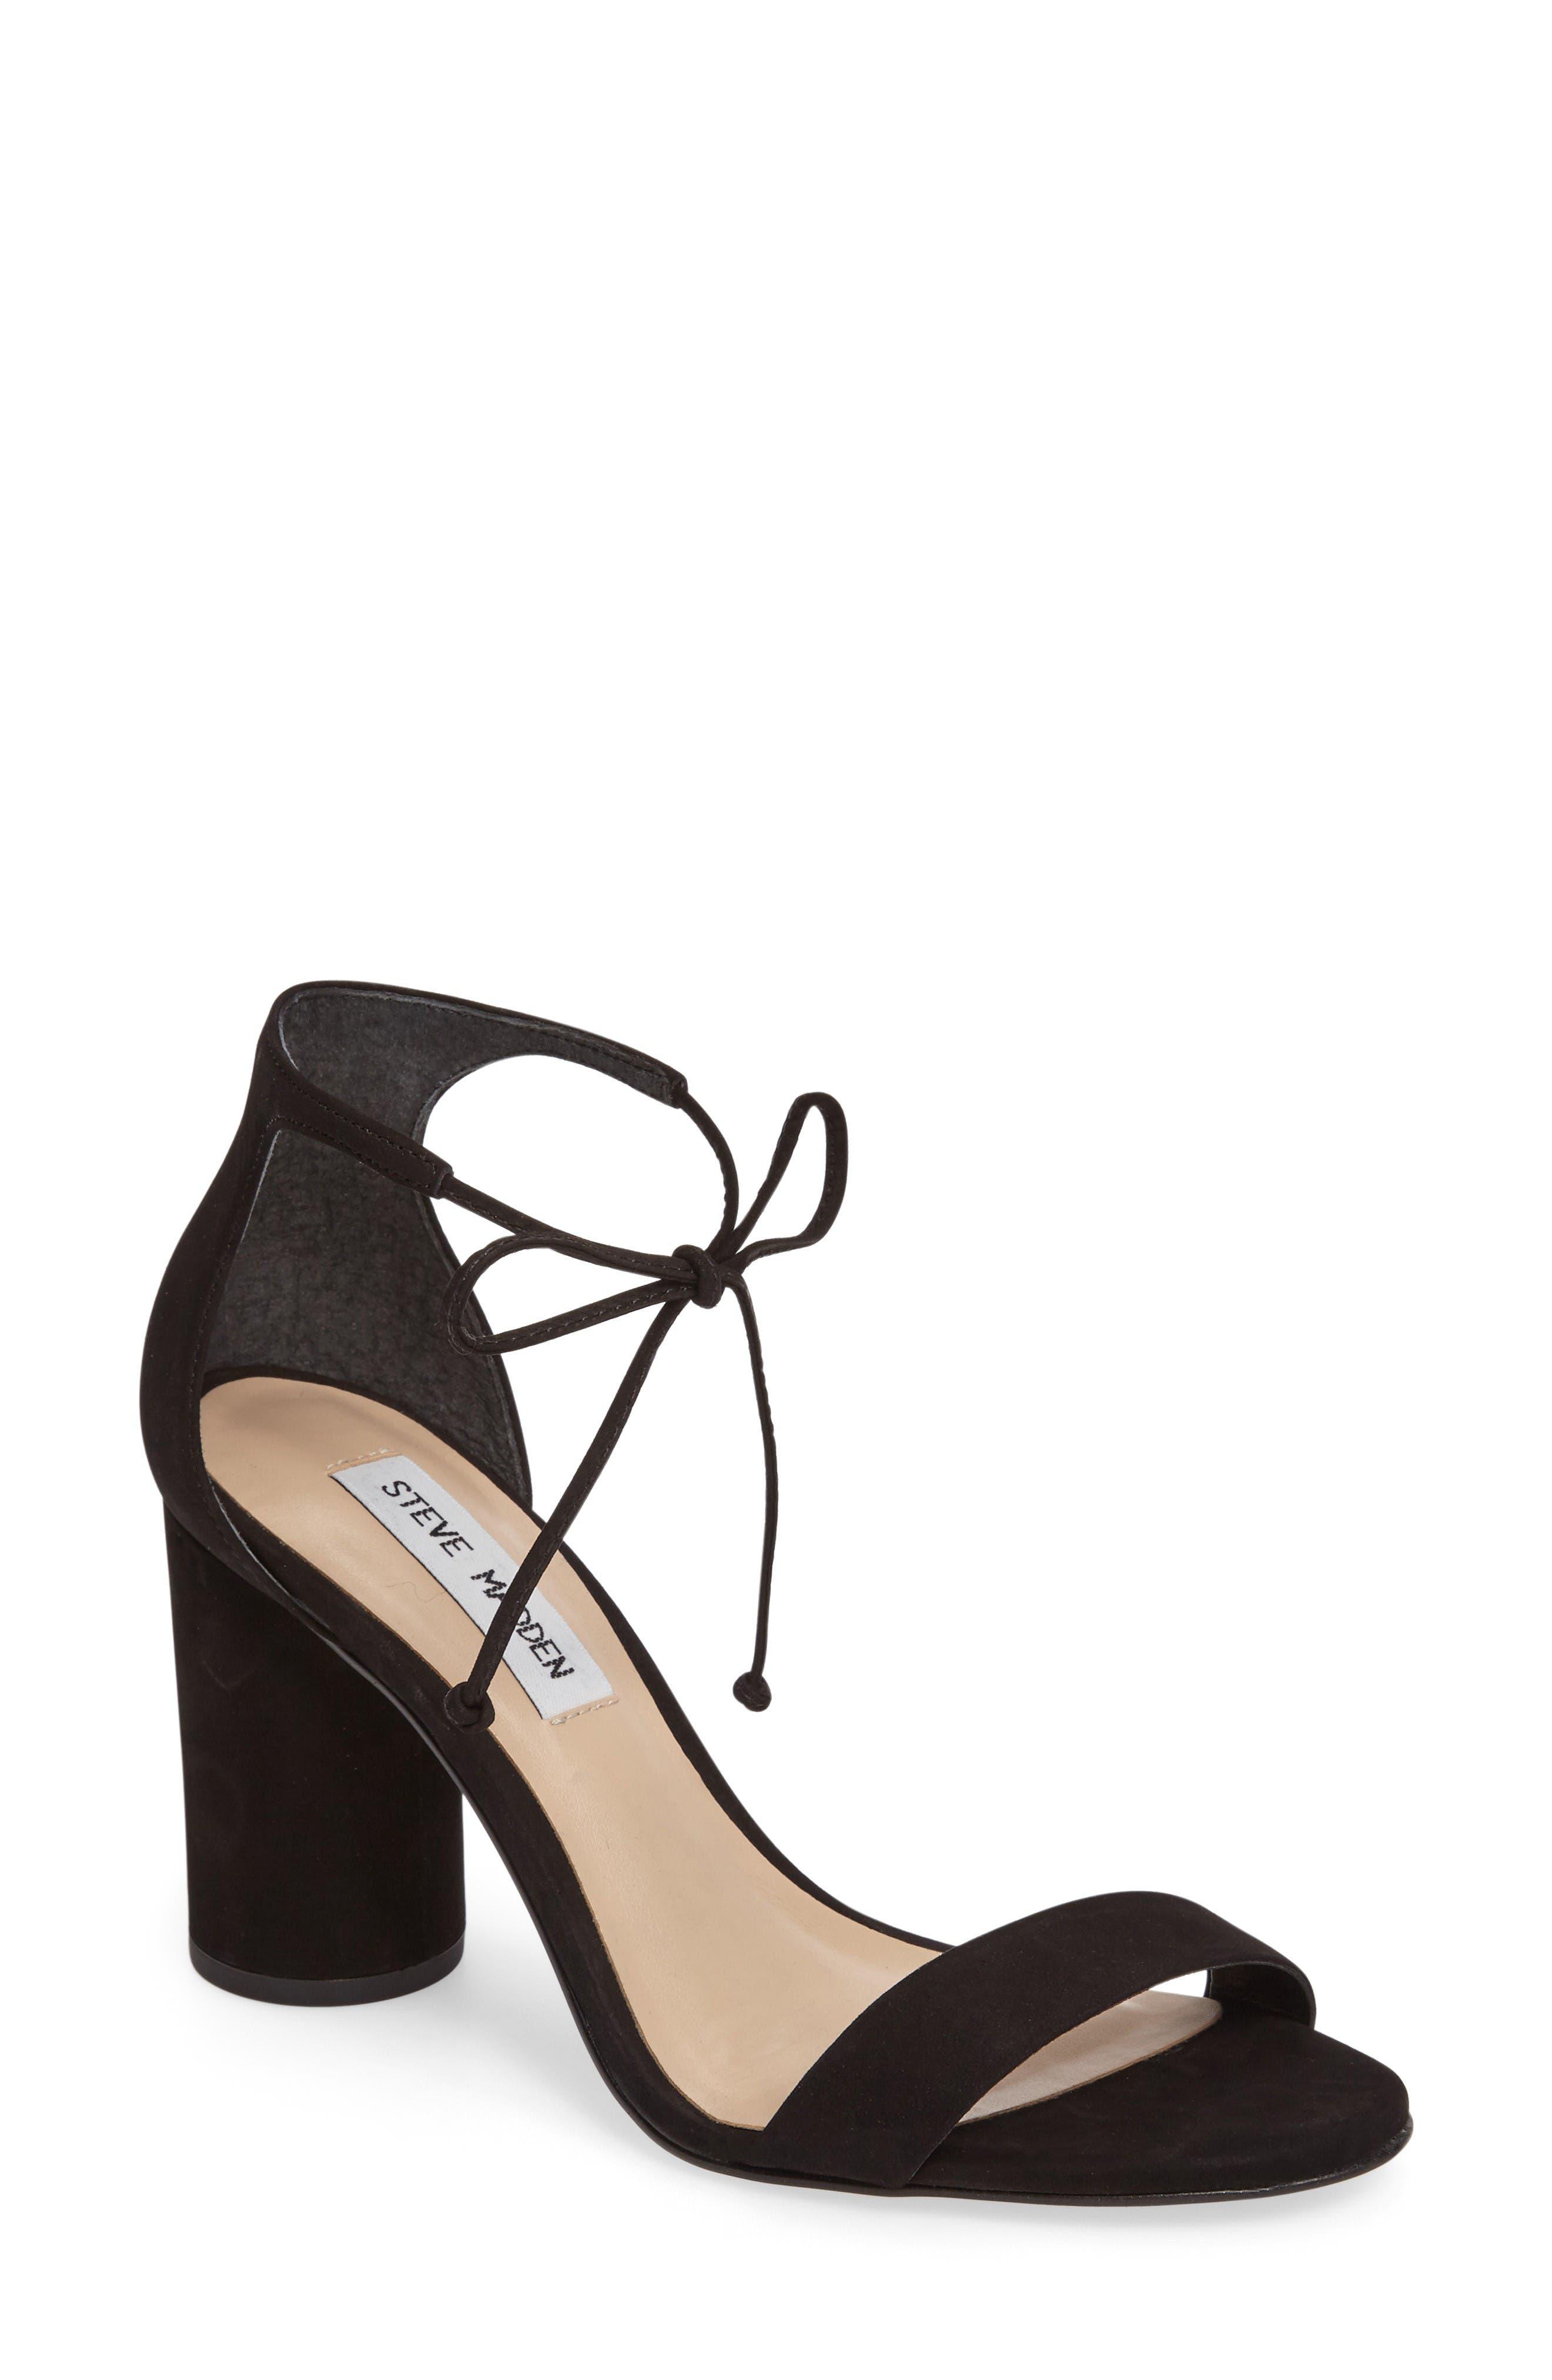 STEVE MADDEN Shays Lace-Up Sandal